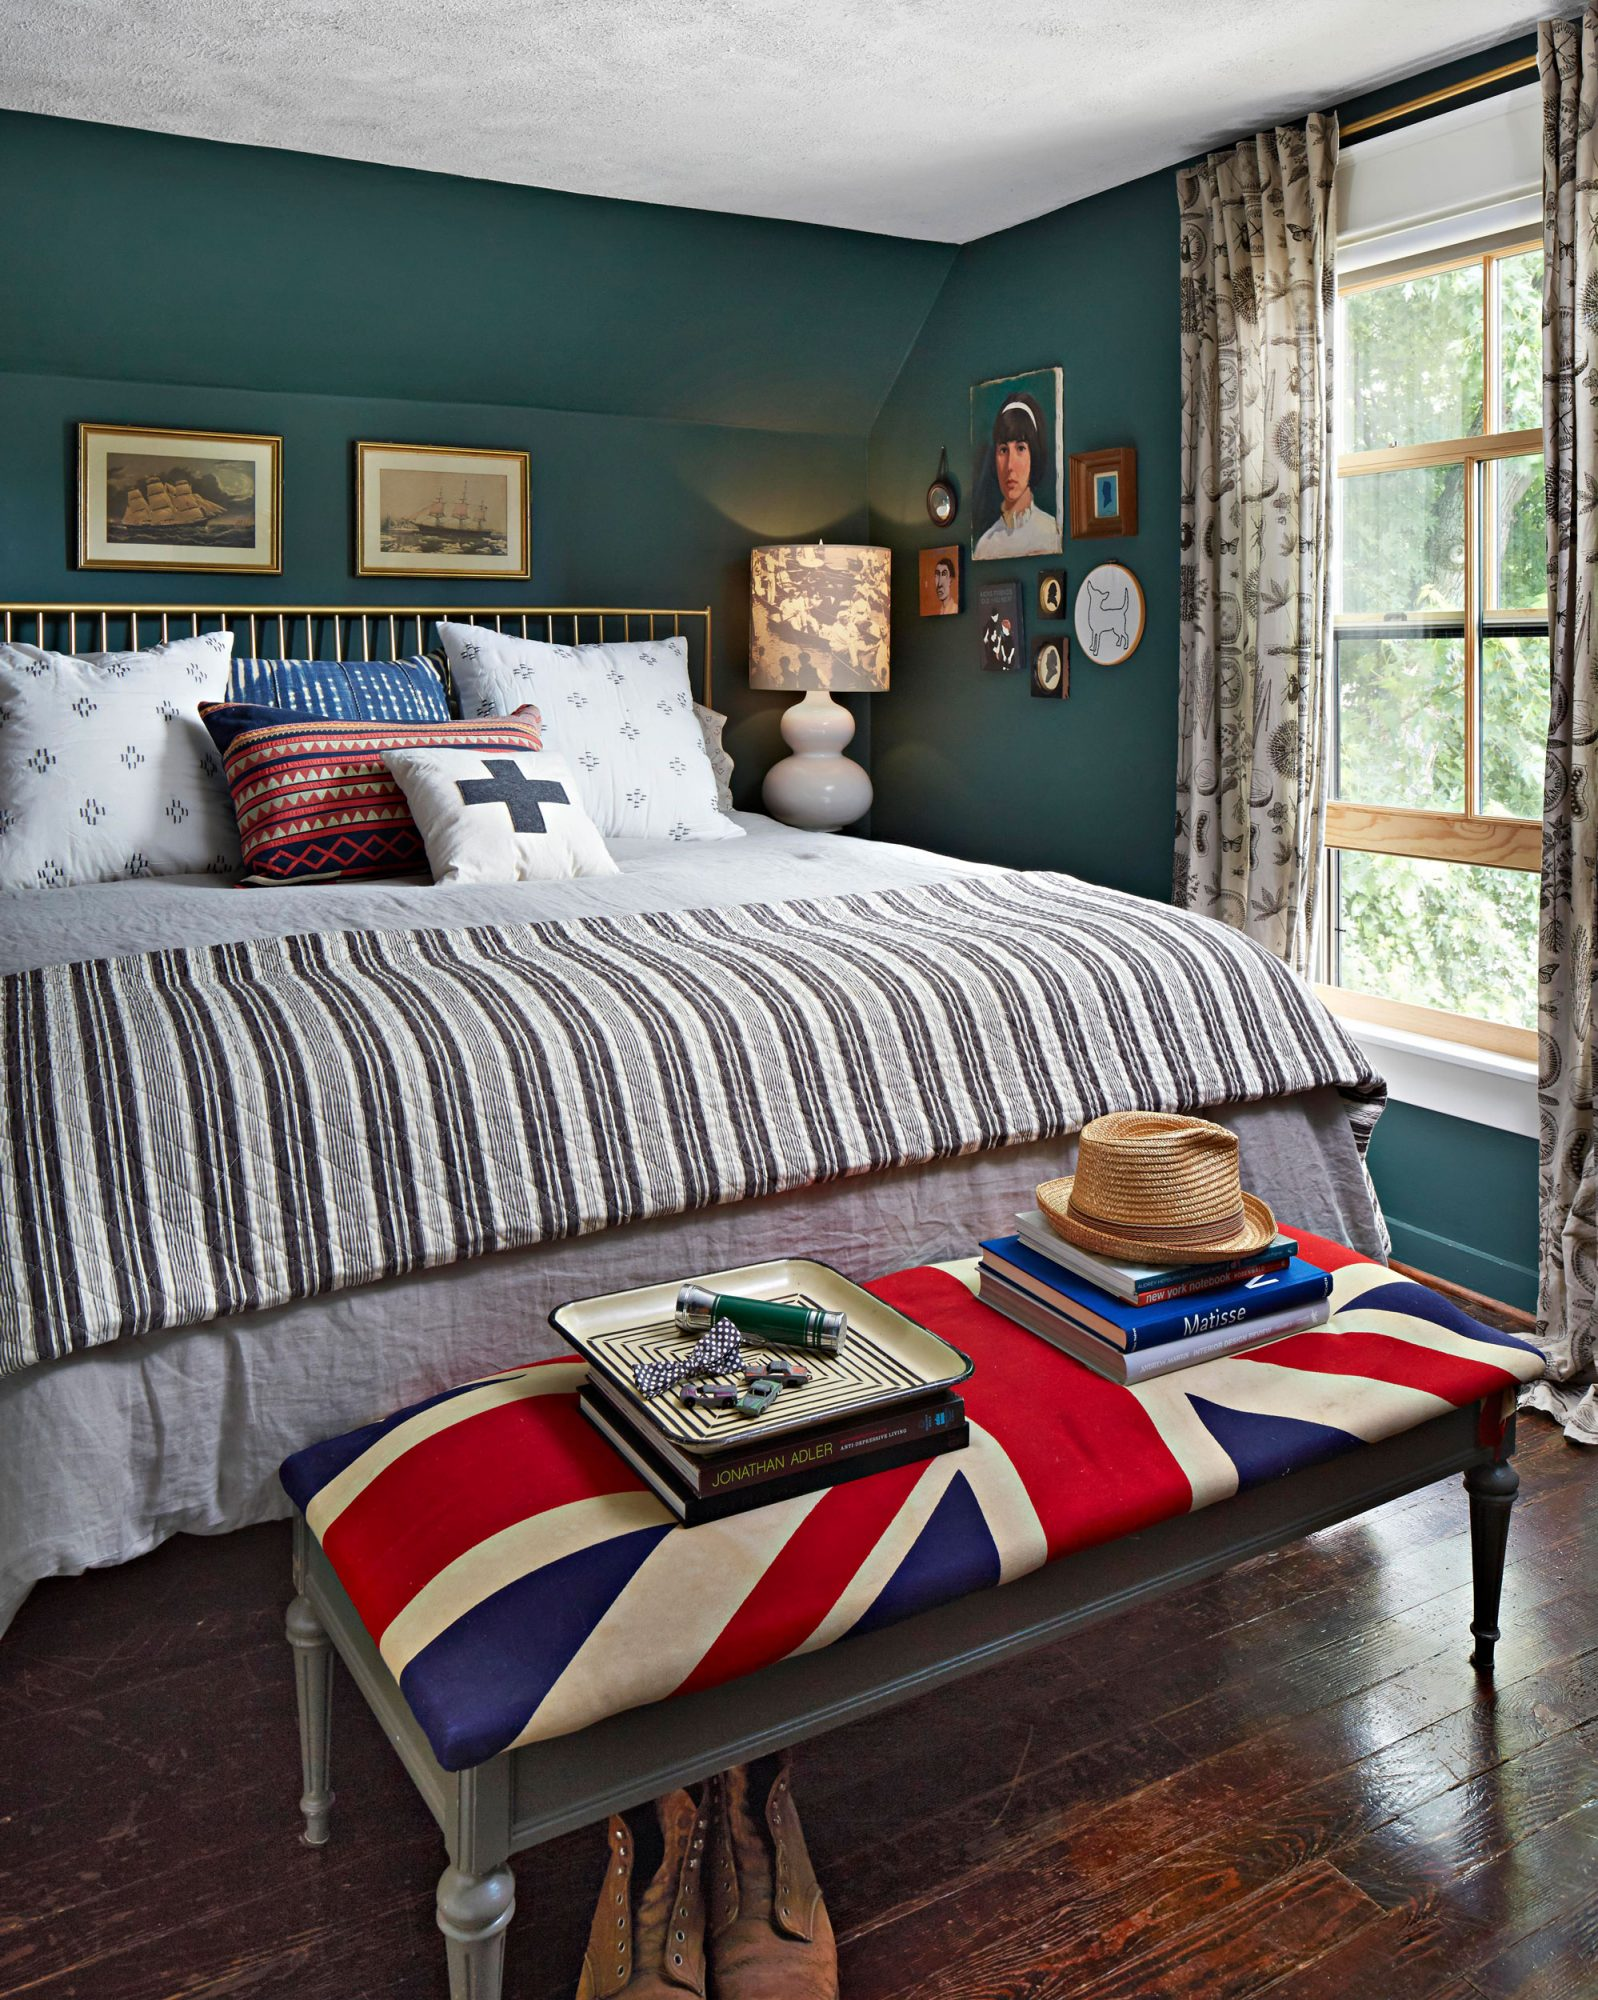 Master bedroom, Boyles home